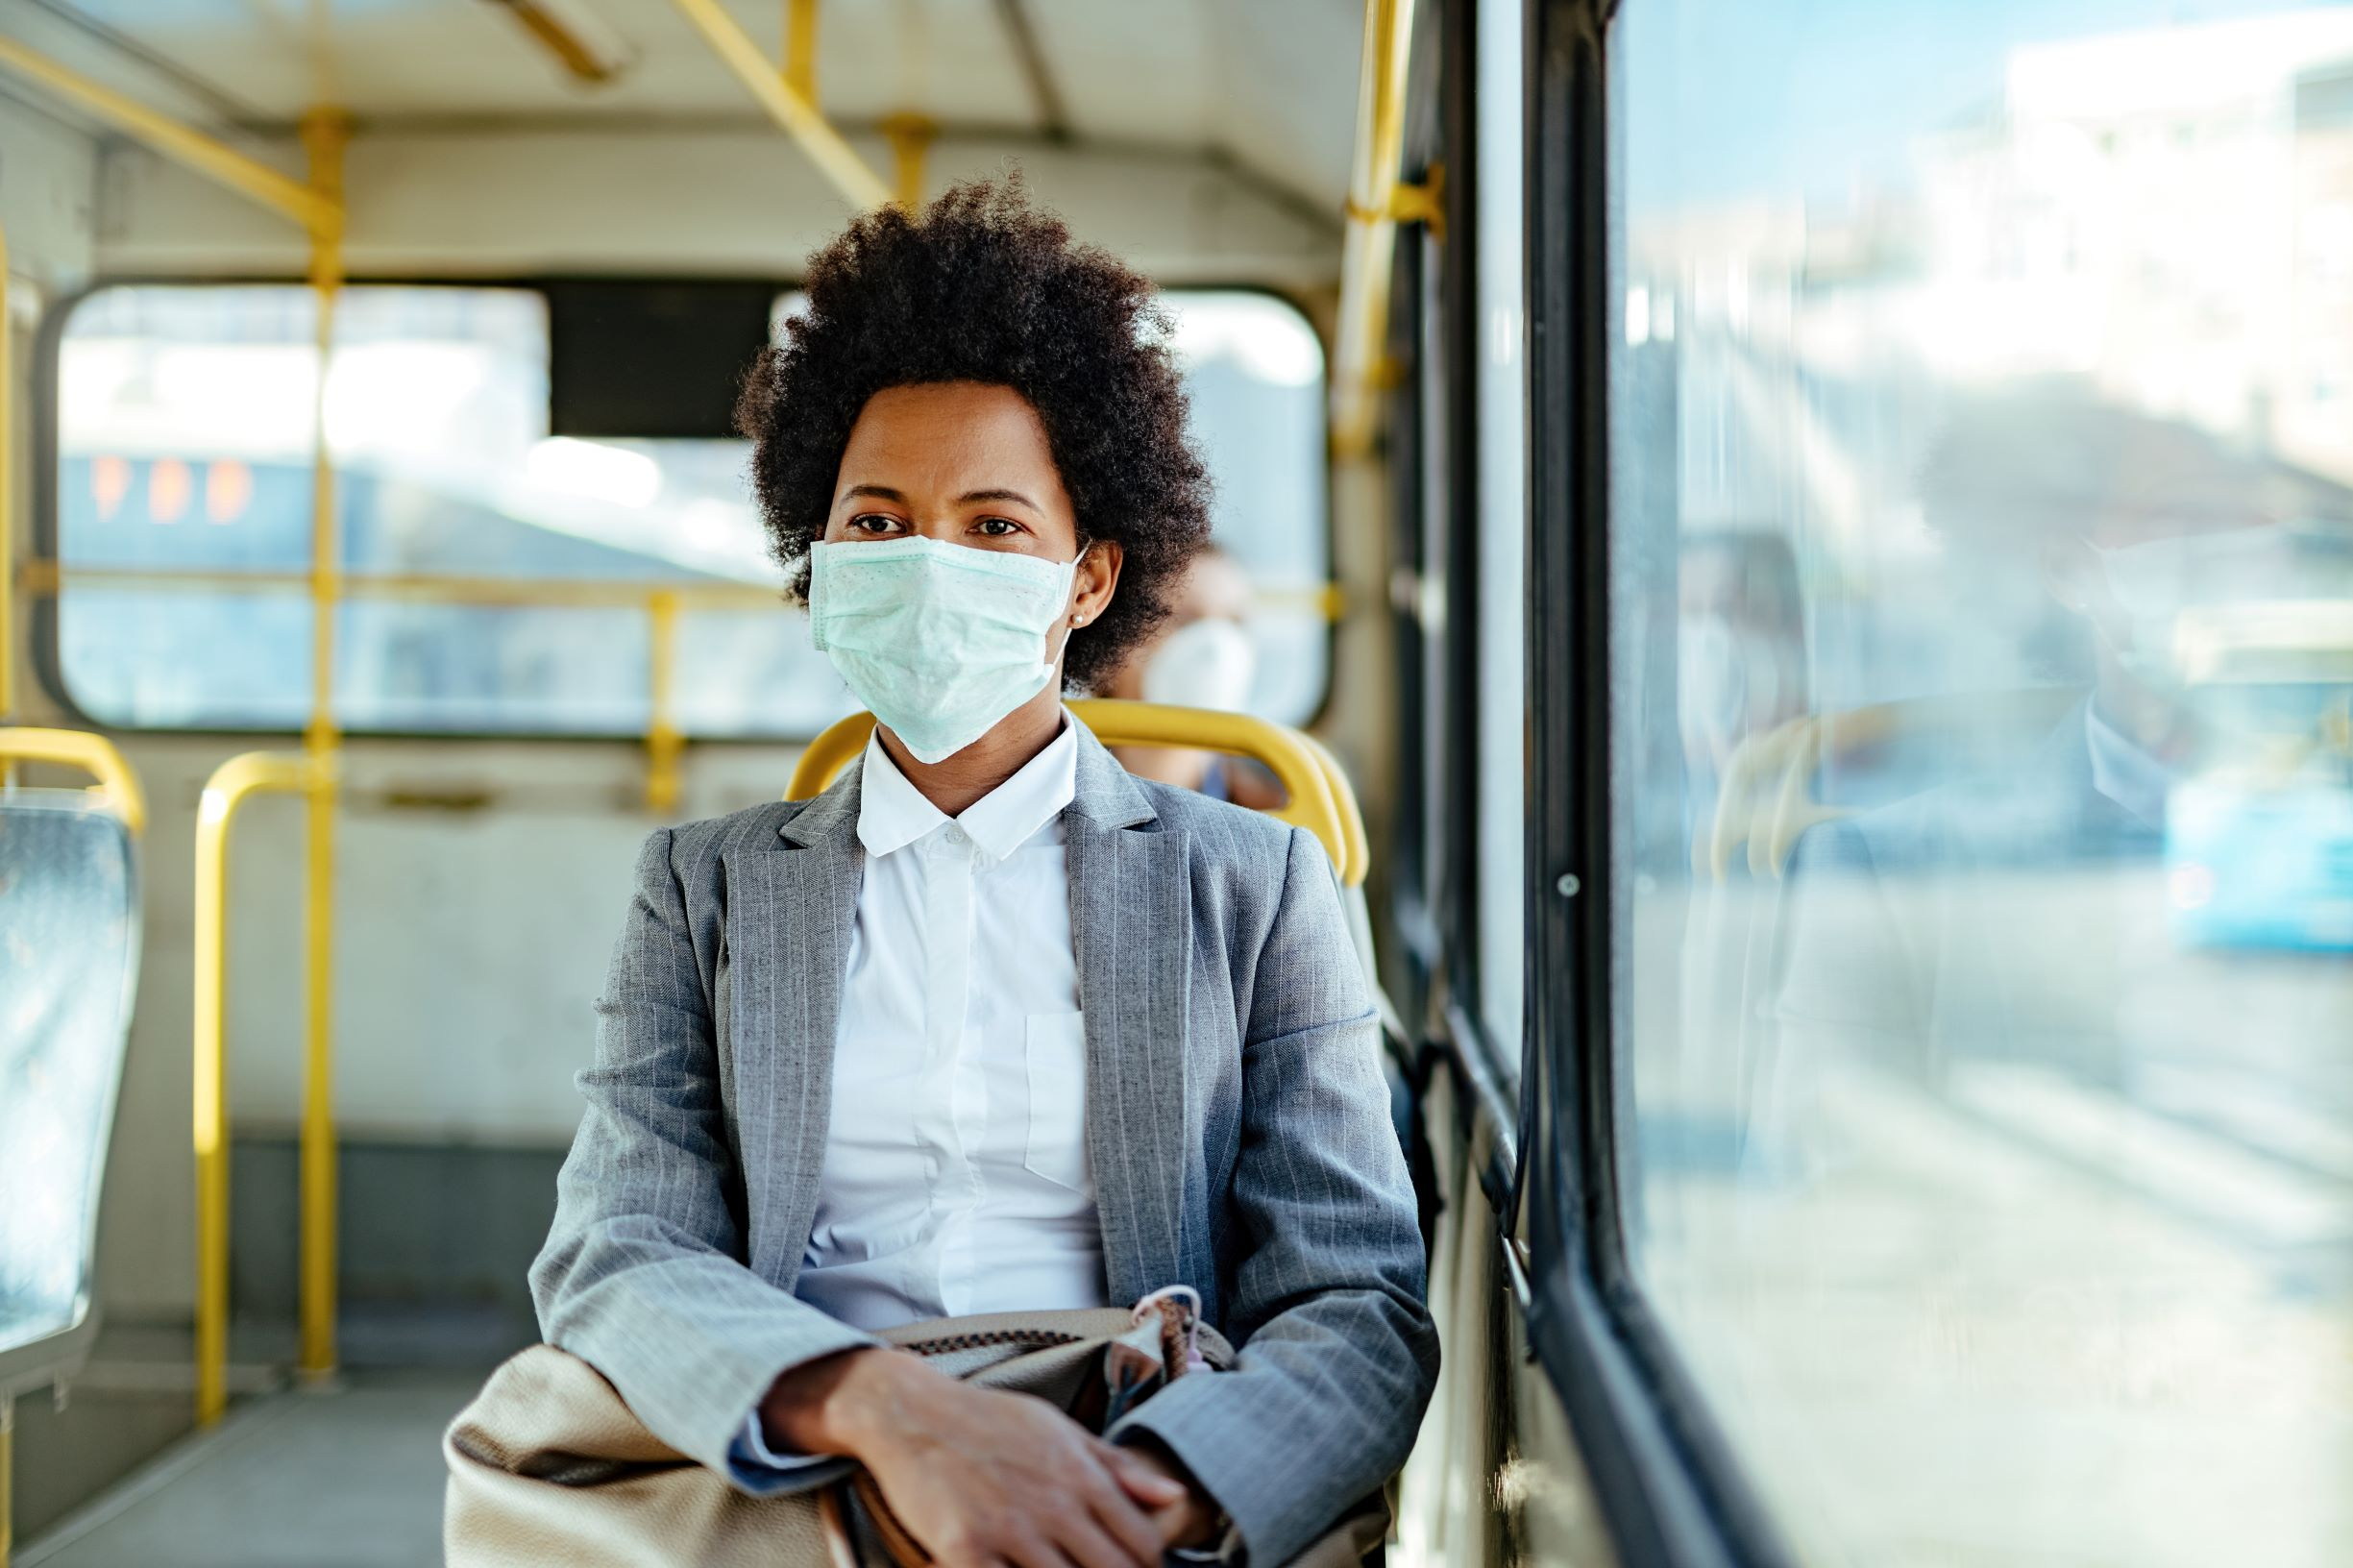 Black-woman-mask-public-transportation